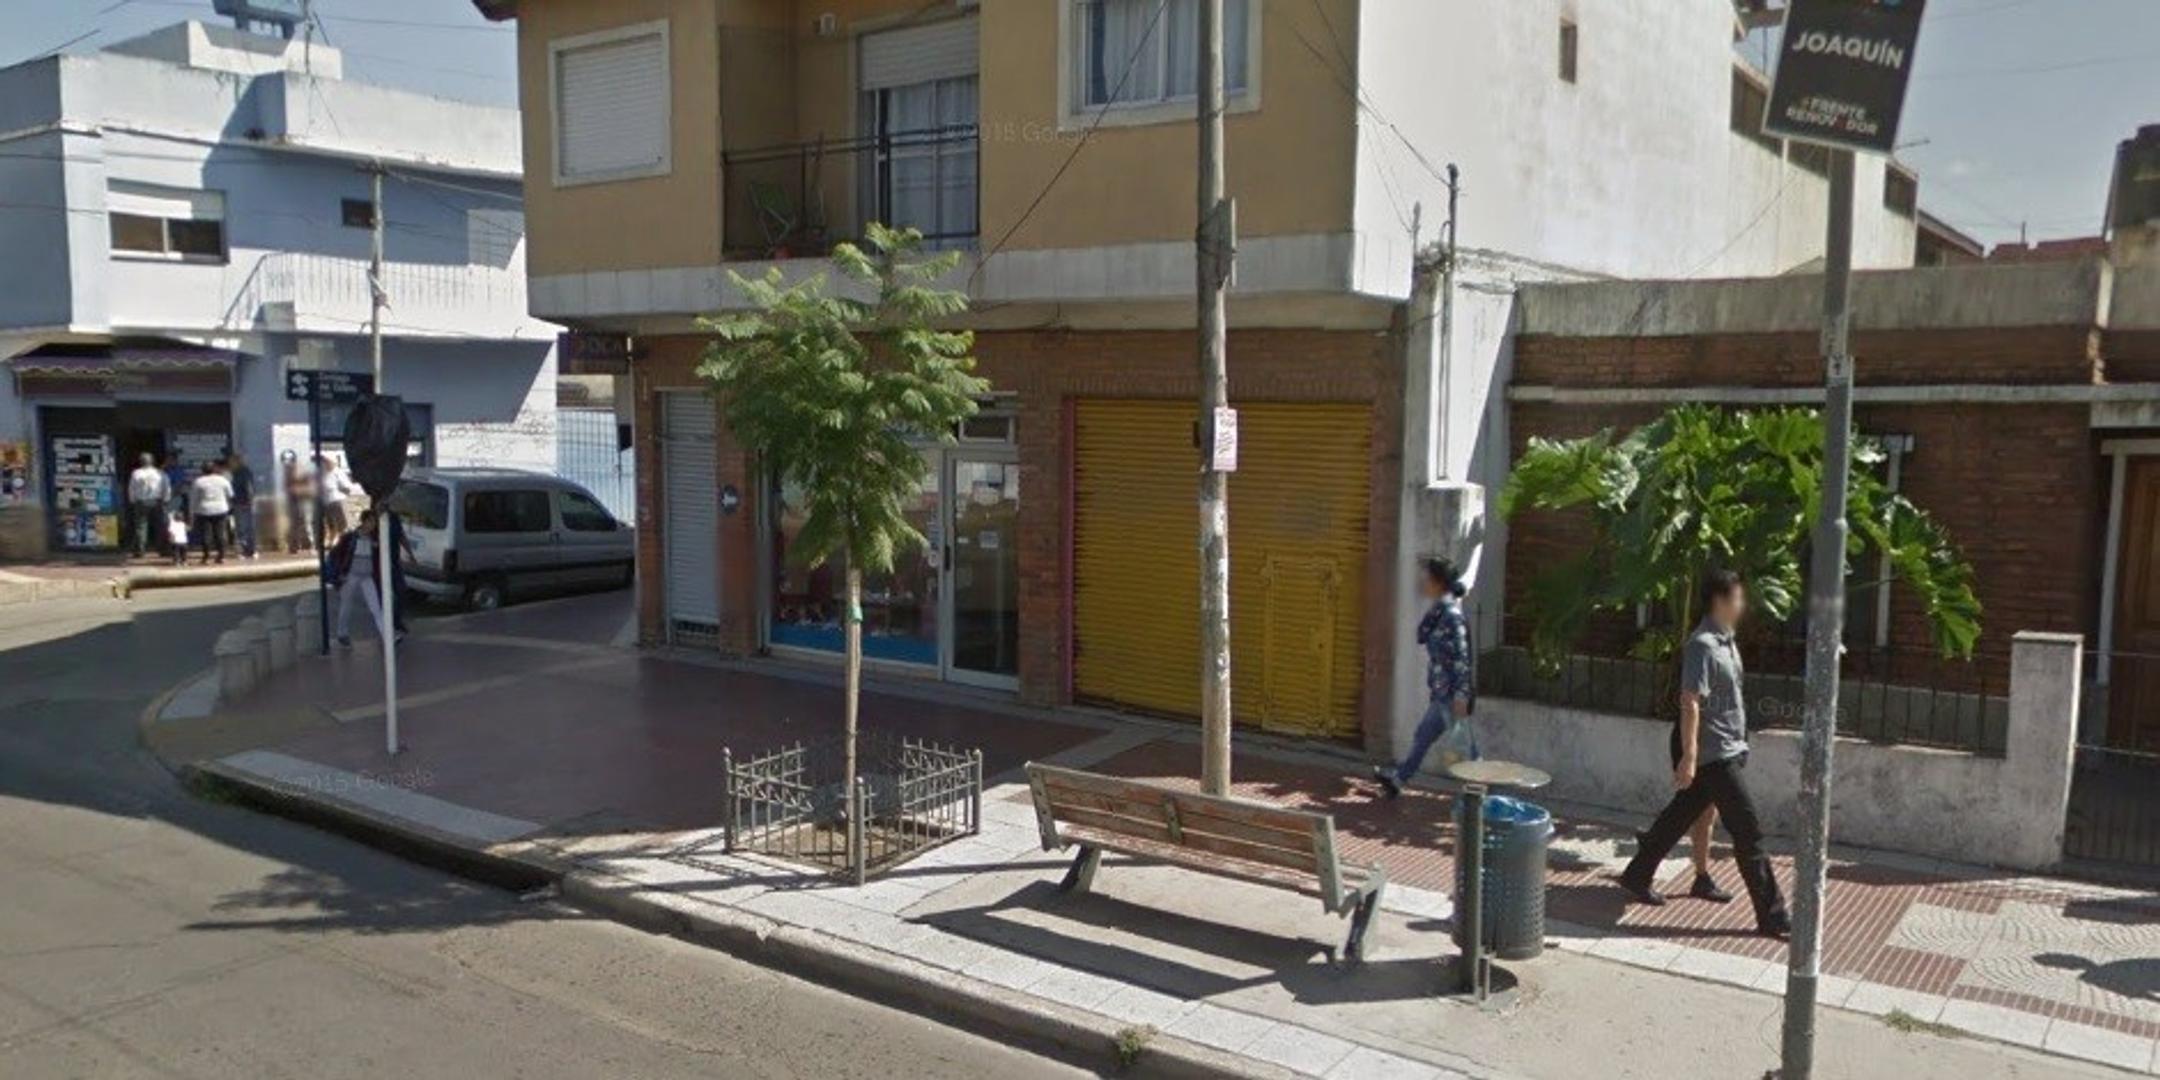 LOCAL ACTUALMENTE RESERVADO - SOBRE AVENIDA COMERCIAL CON ALTO TRANSITO VEHICULAR Y COLECTIVOS